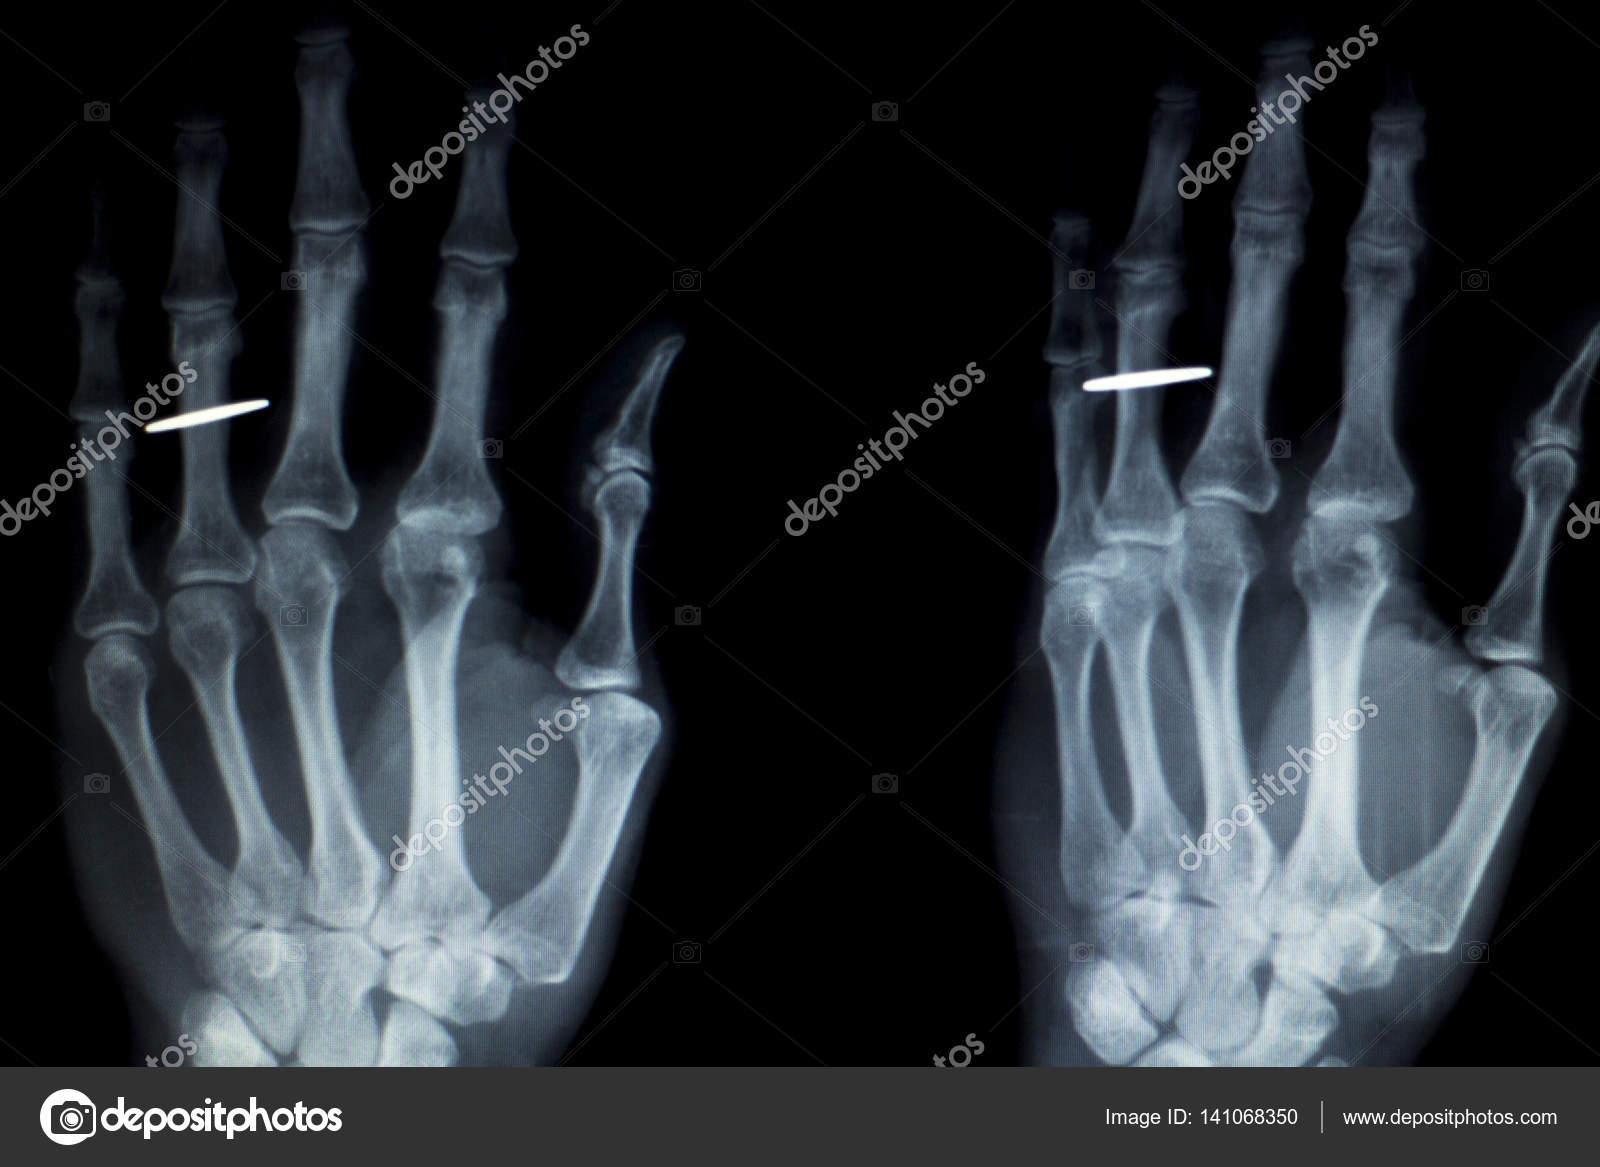 Finger der Hand Implantat Xray scan — Stockfoto © edwardolive #141068350